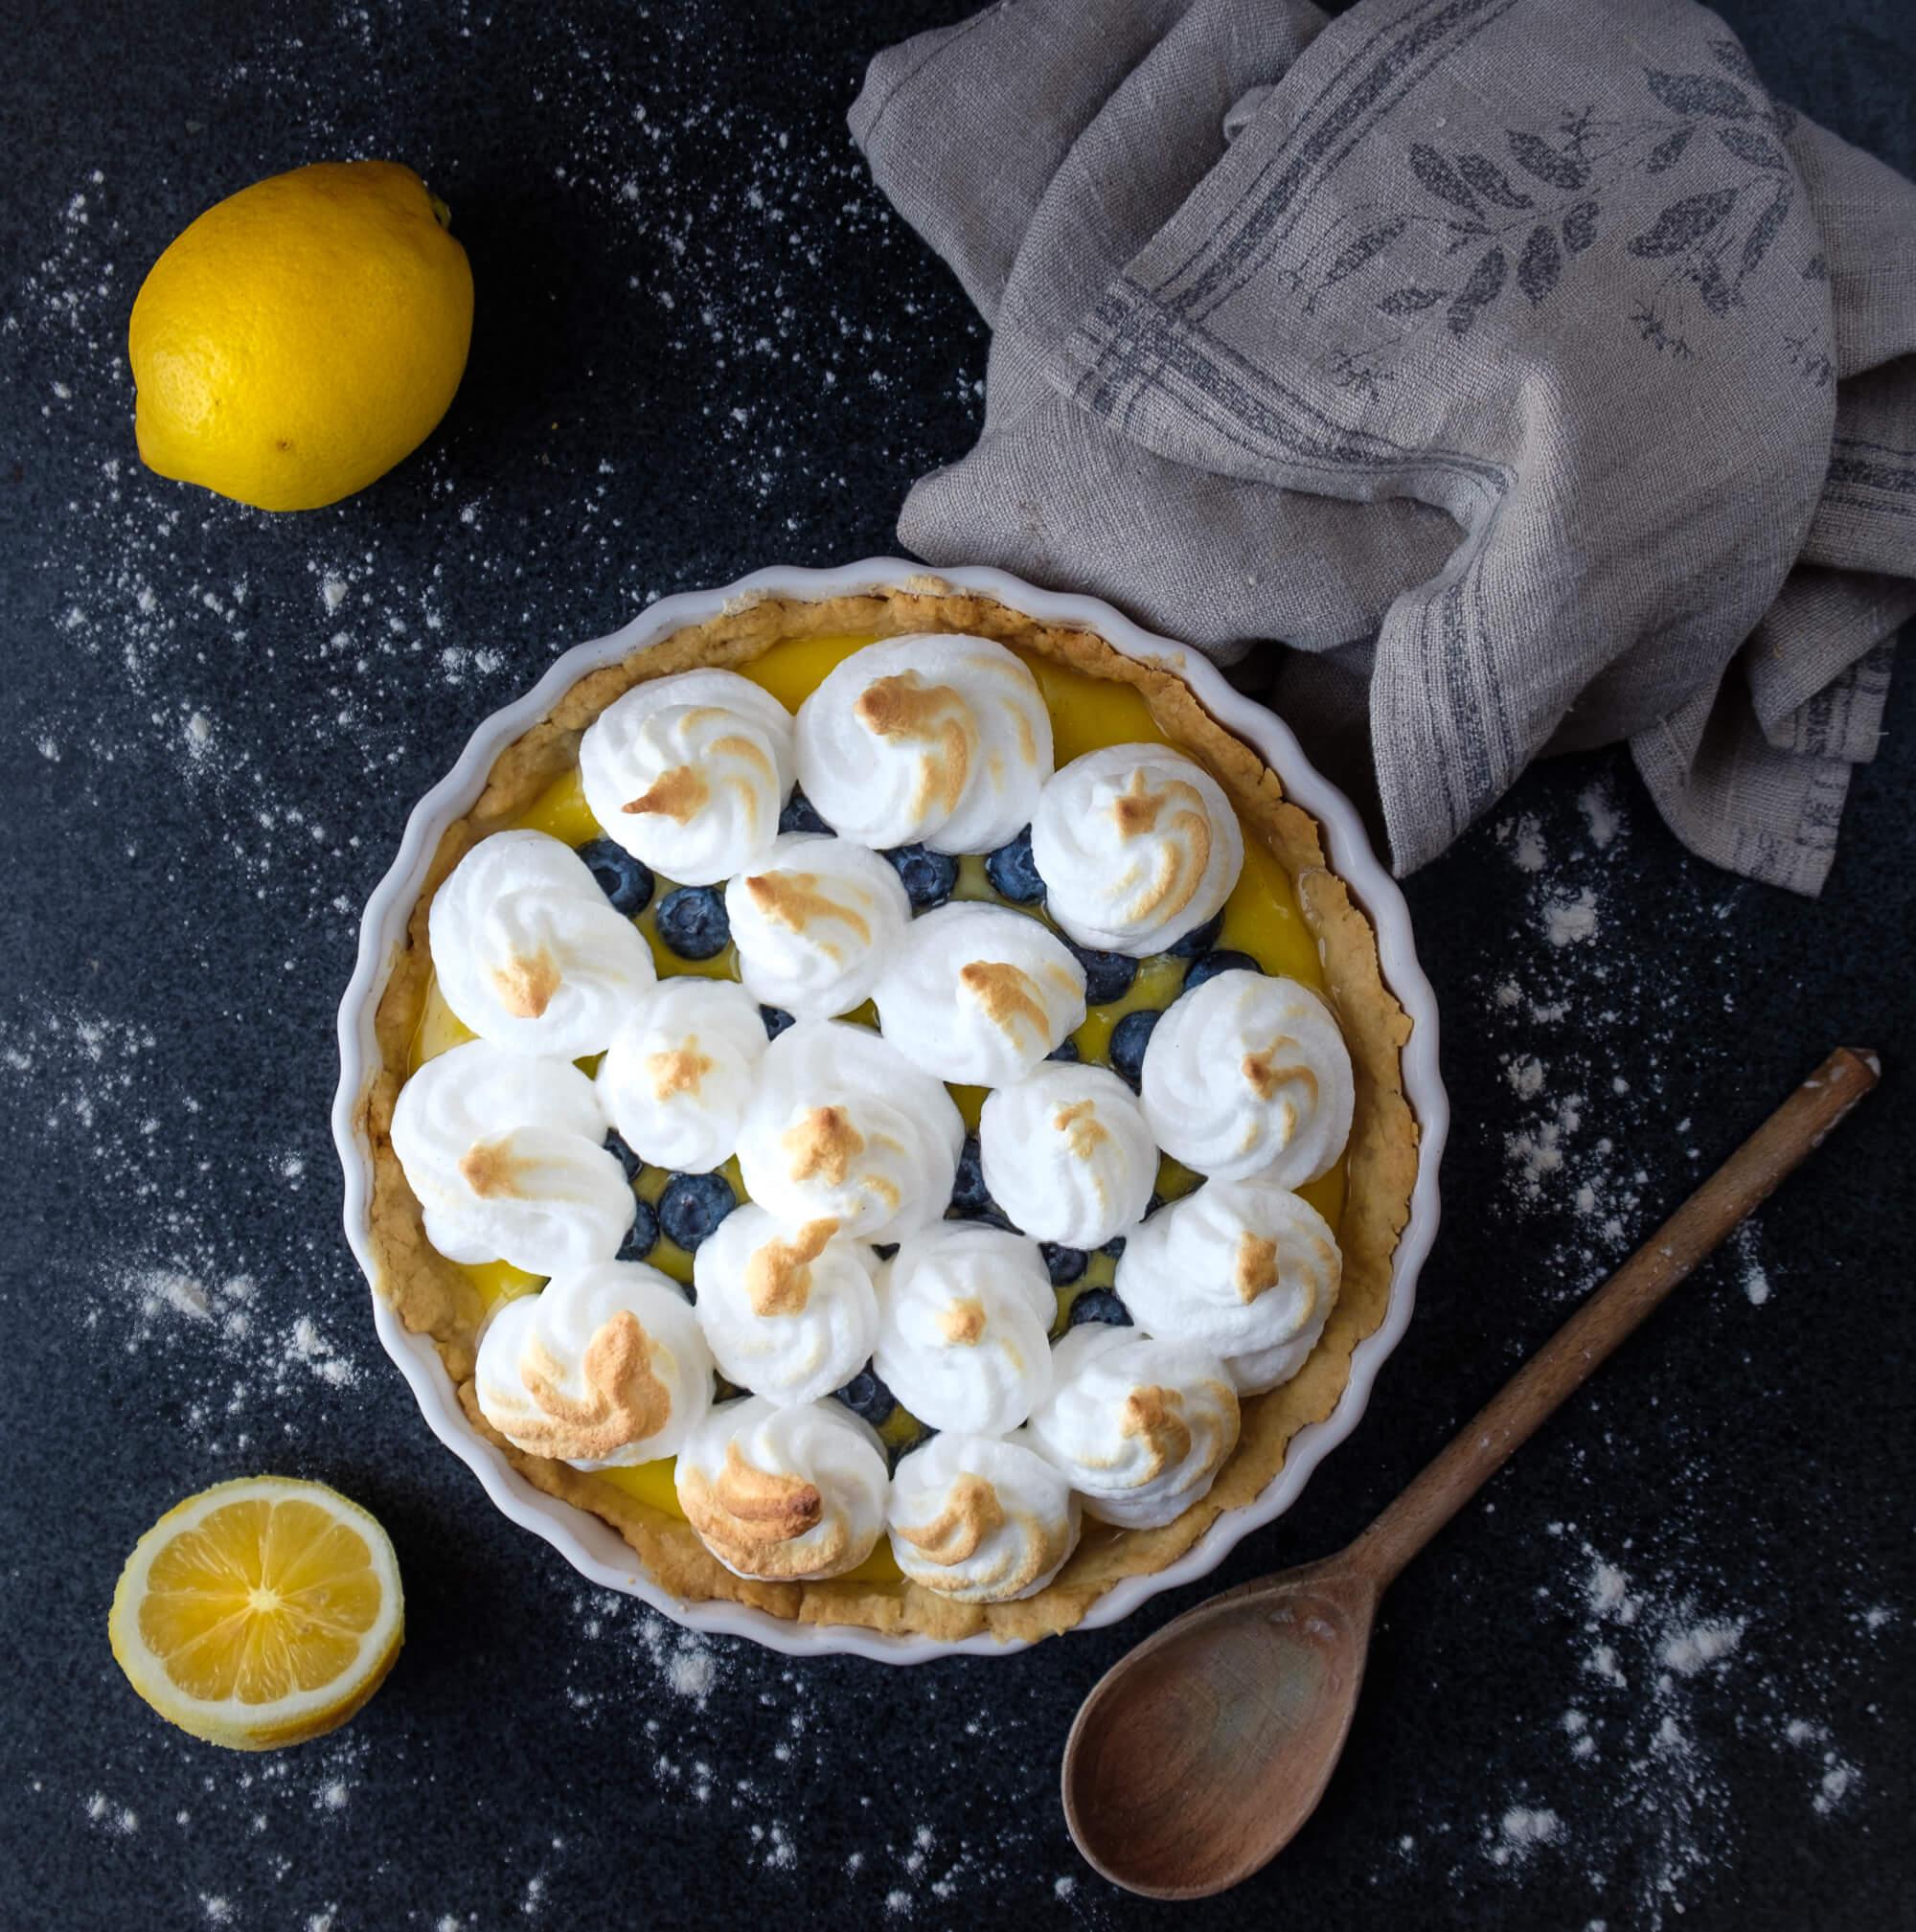 Lemon & Blueberry Meringue Pie